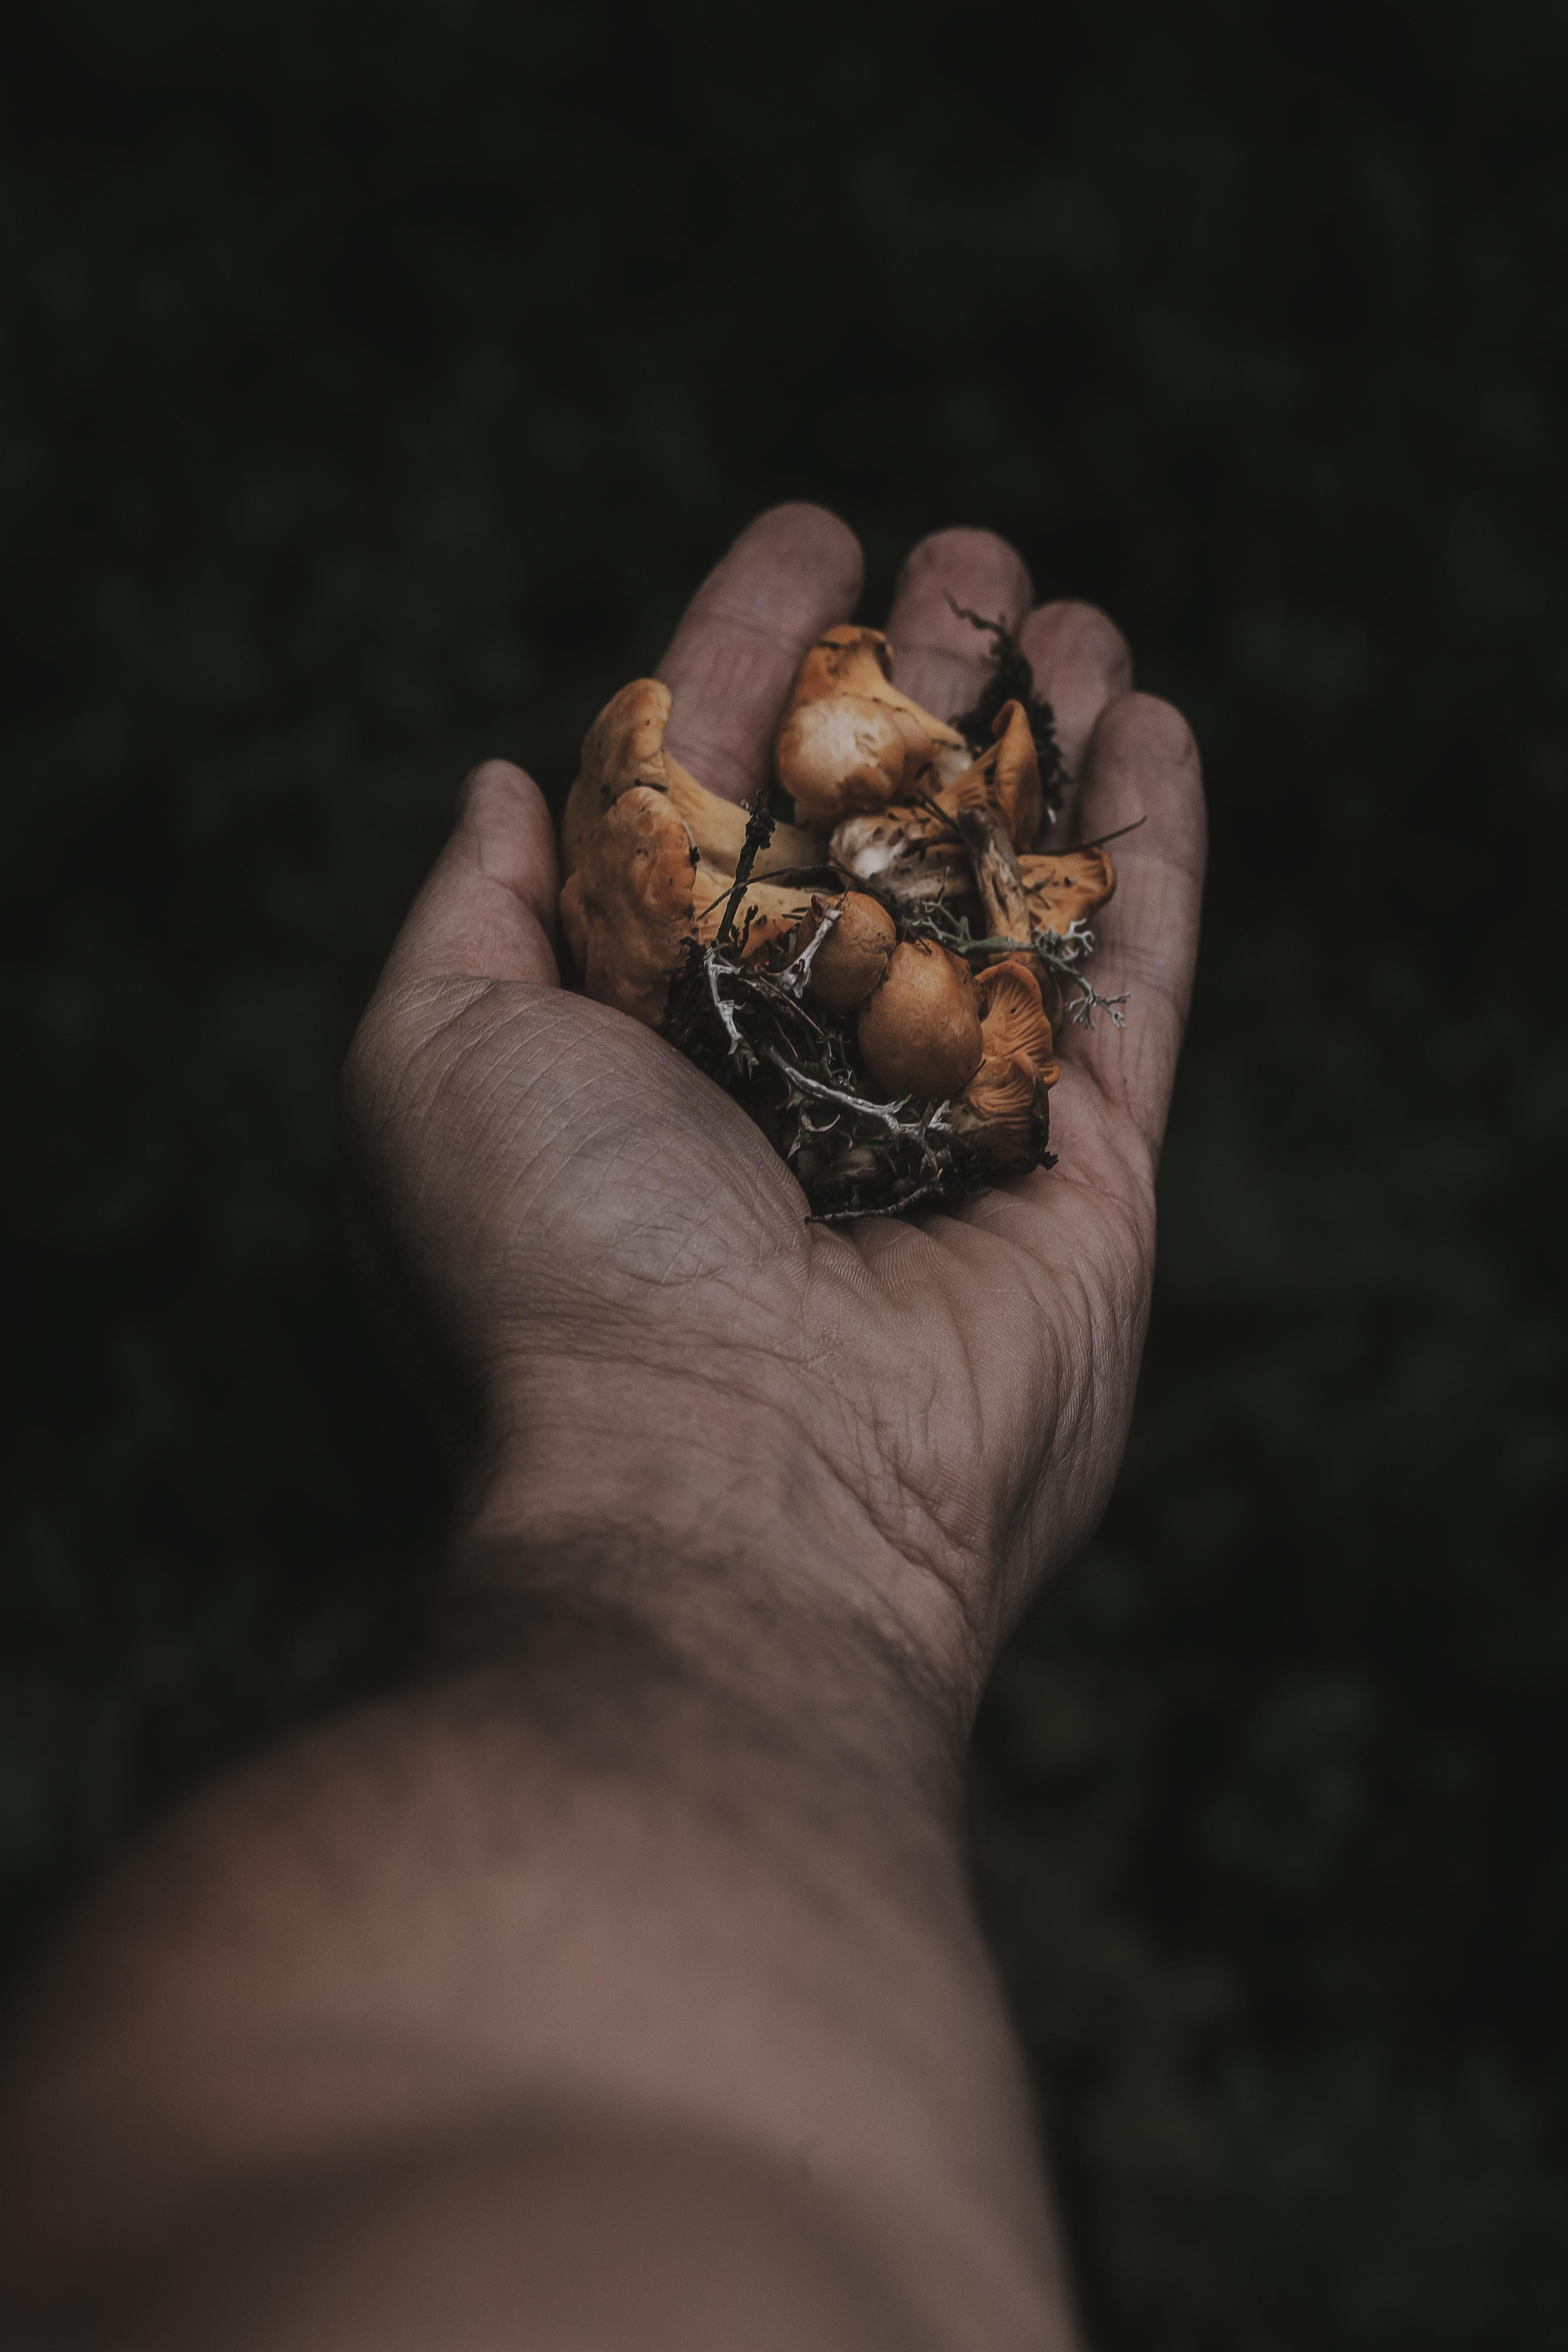 person holding mushrooms